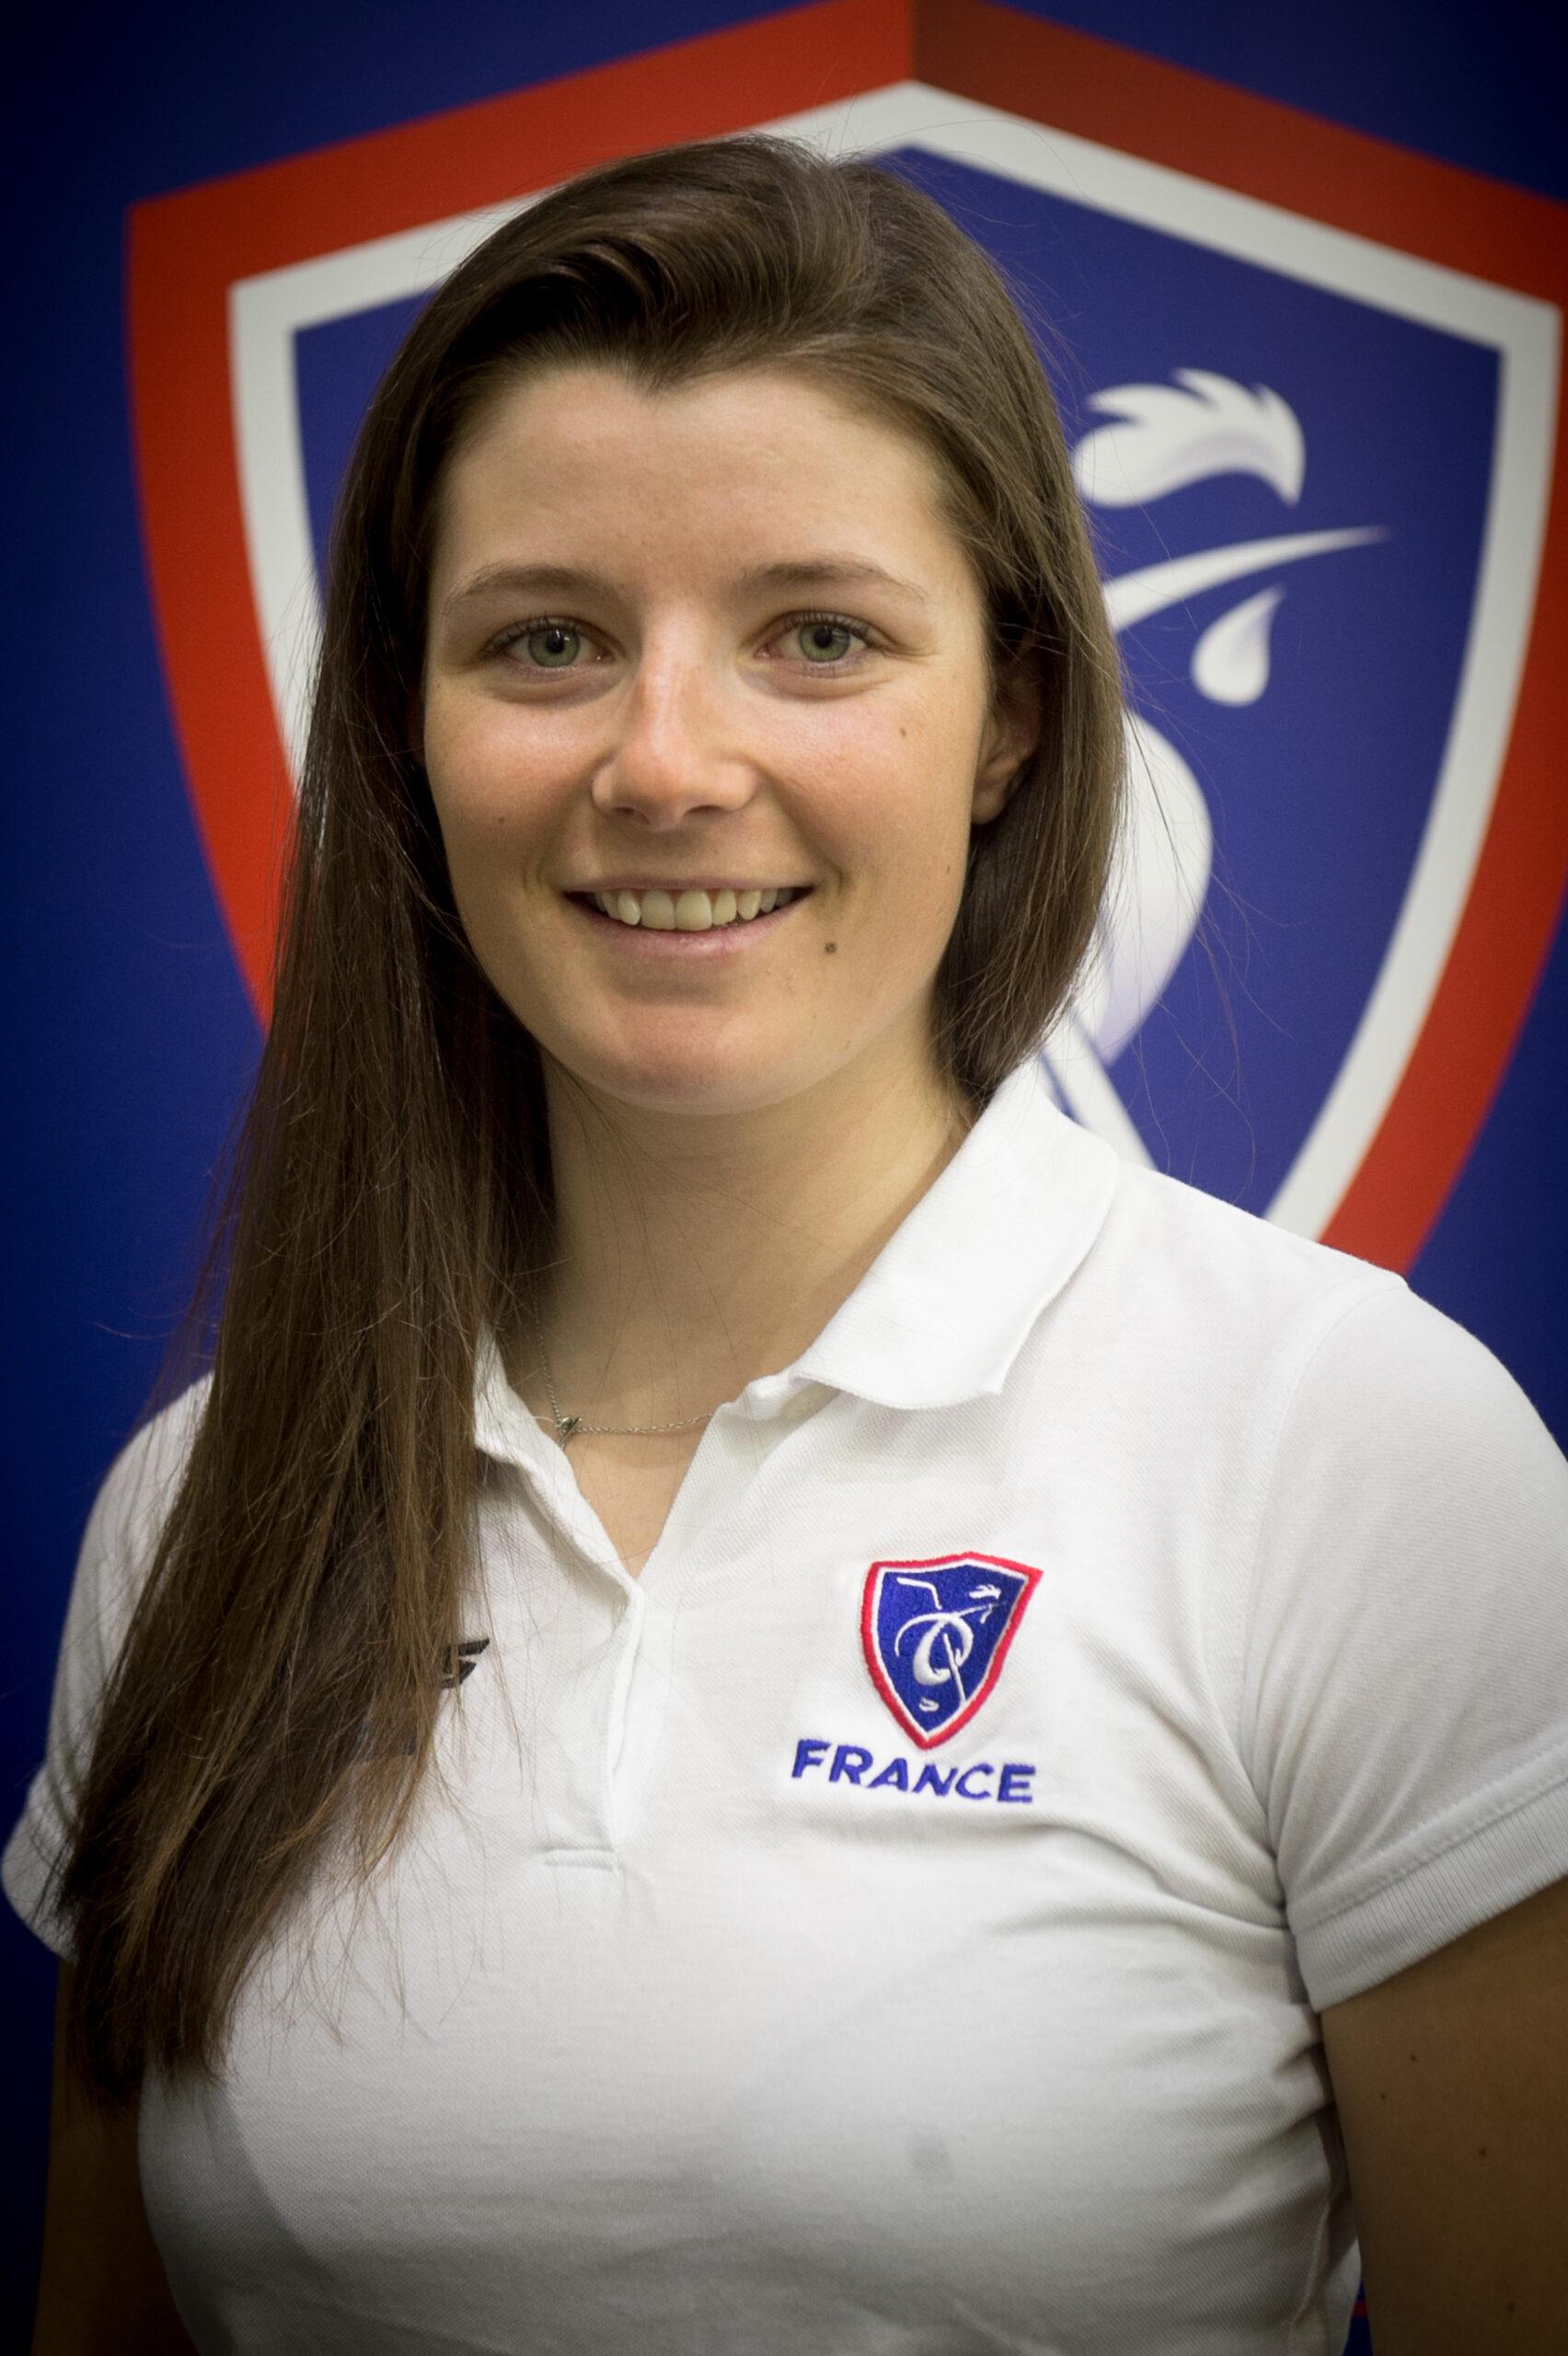 Clara Rozier